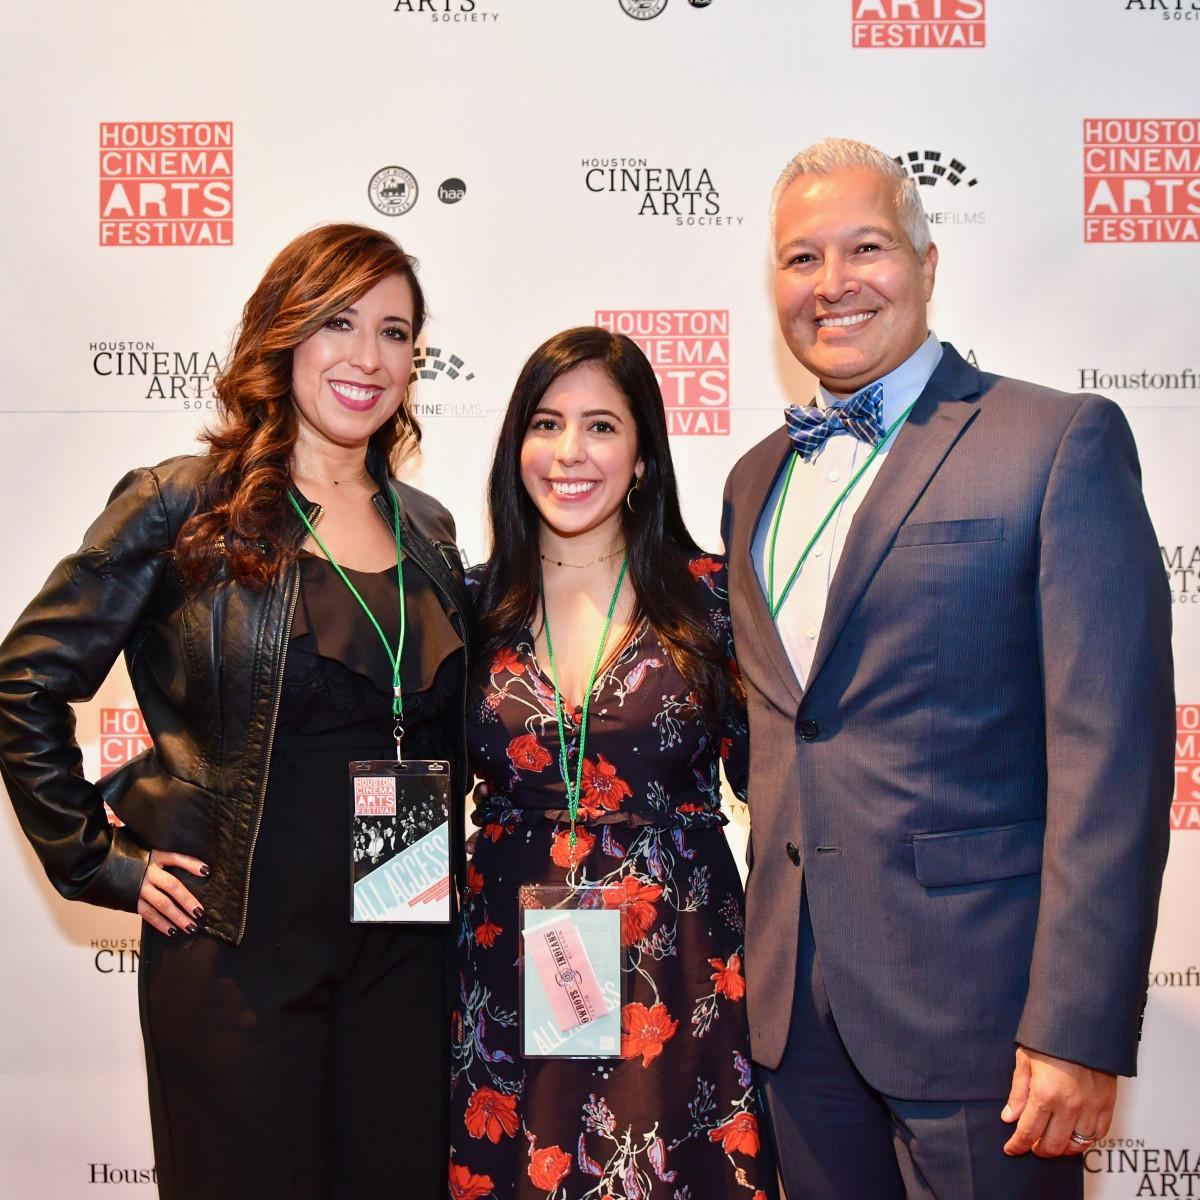 HCAF 2019 Opening Night: Liza Diaz, Alyssa Knoles, Albee Diaz